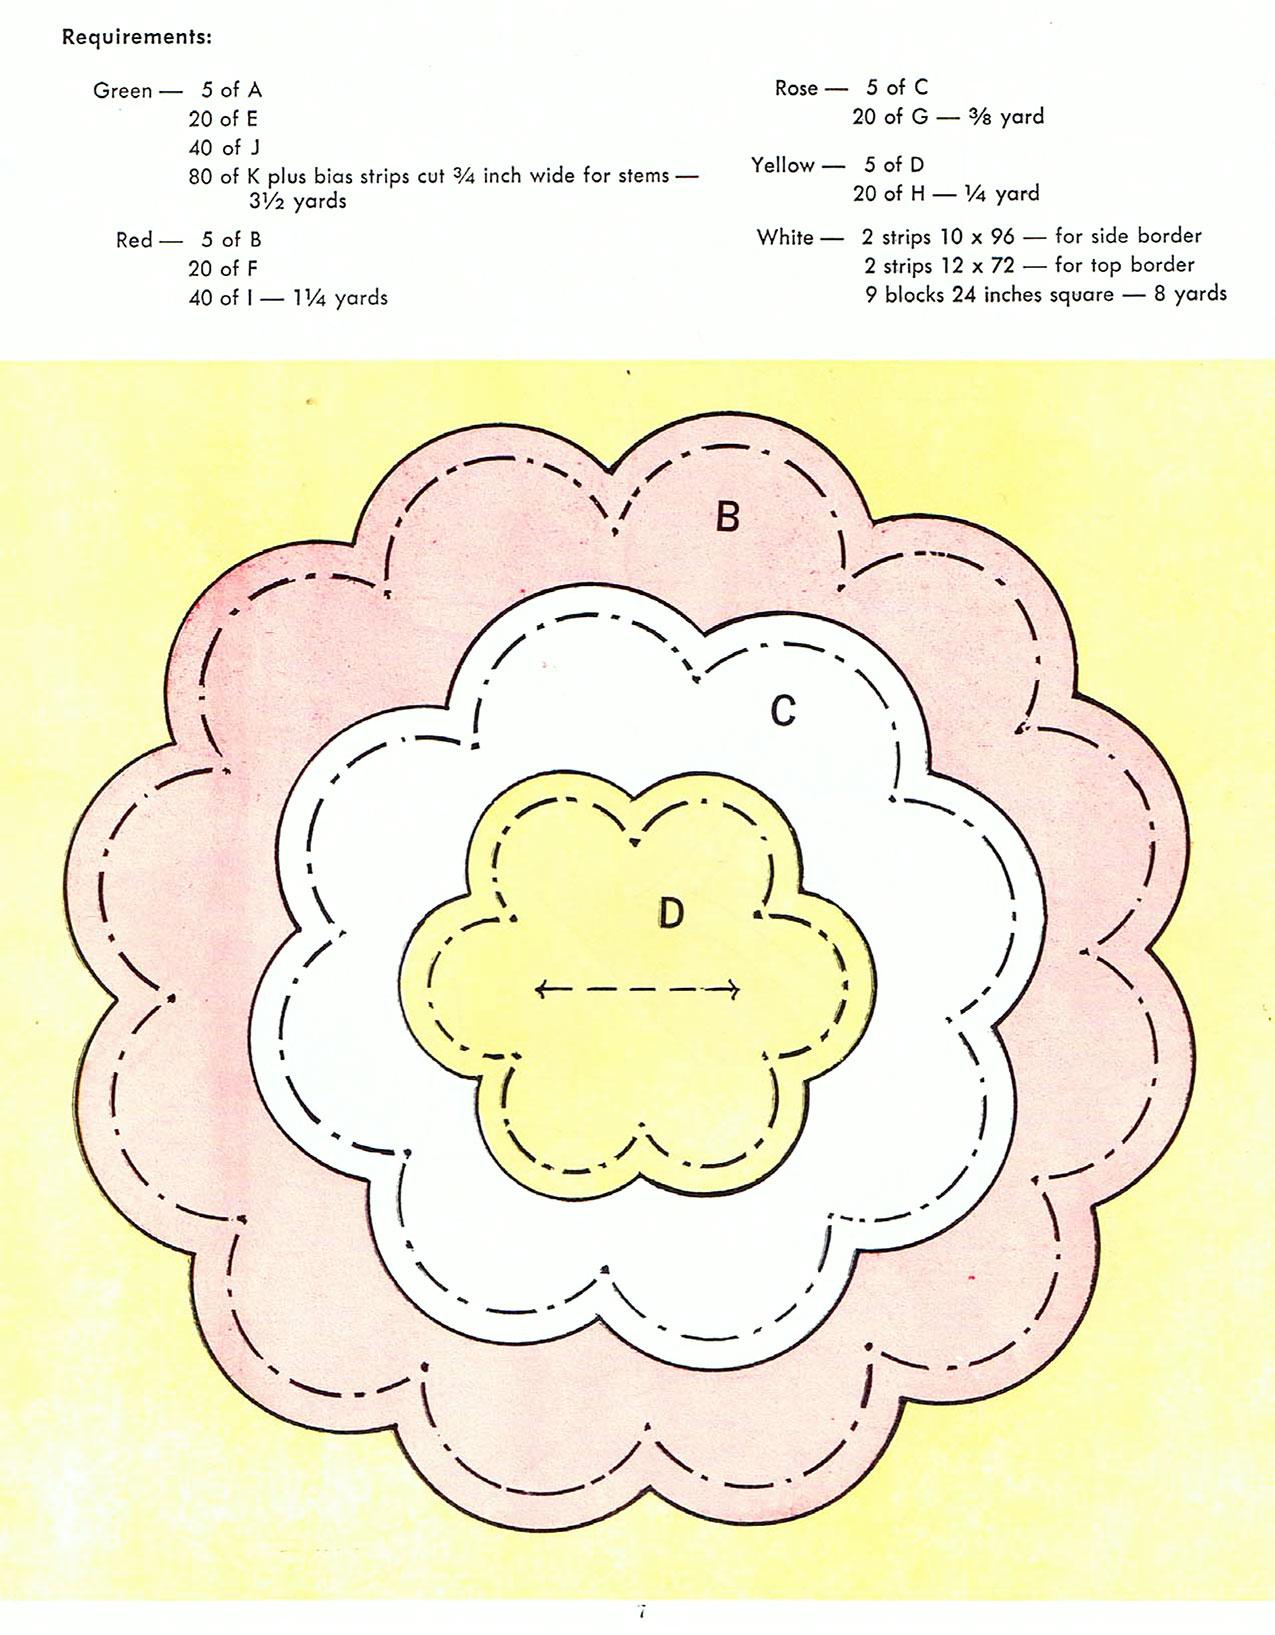 http://qisforquilter.com/wp-content/uploads/2012/11/Sixteen-Blue-Ribbon-Quilts-9.jpg